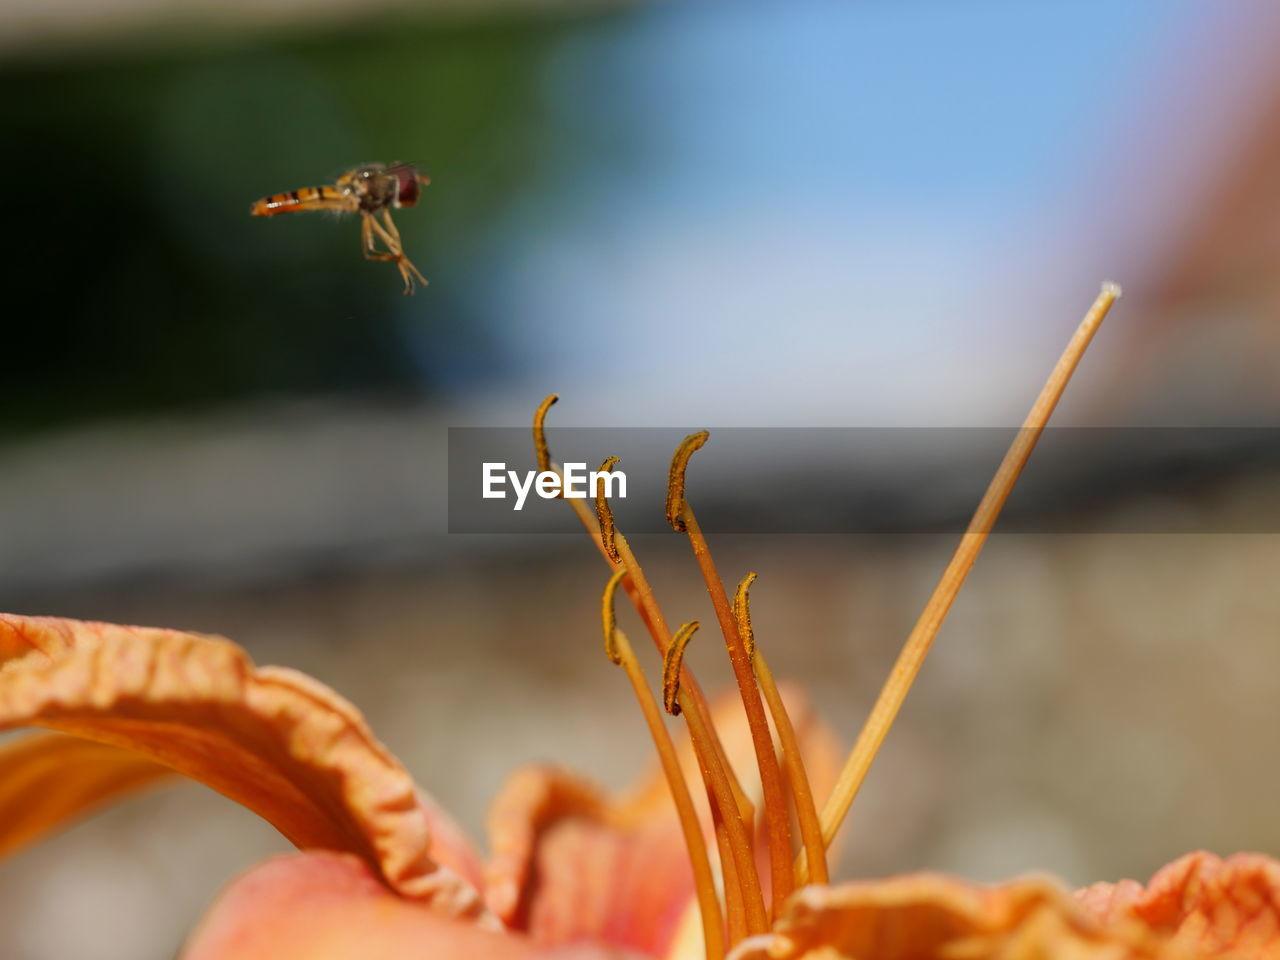 Dragonfly flying over orange lily flower